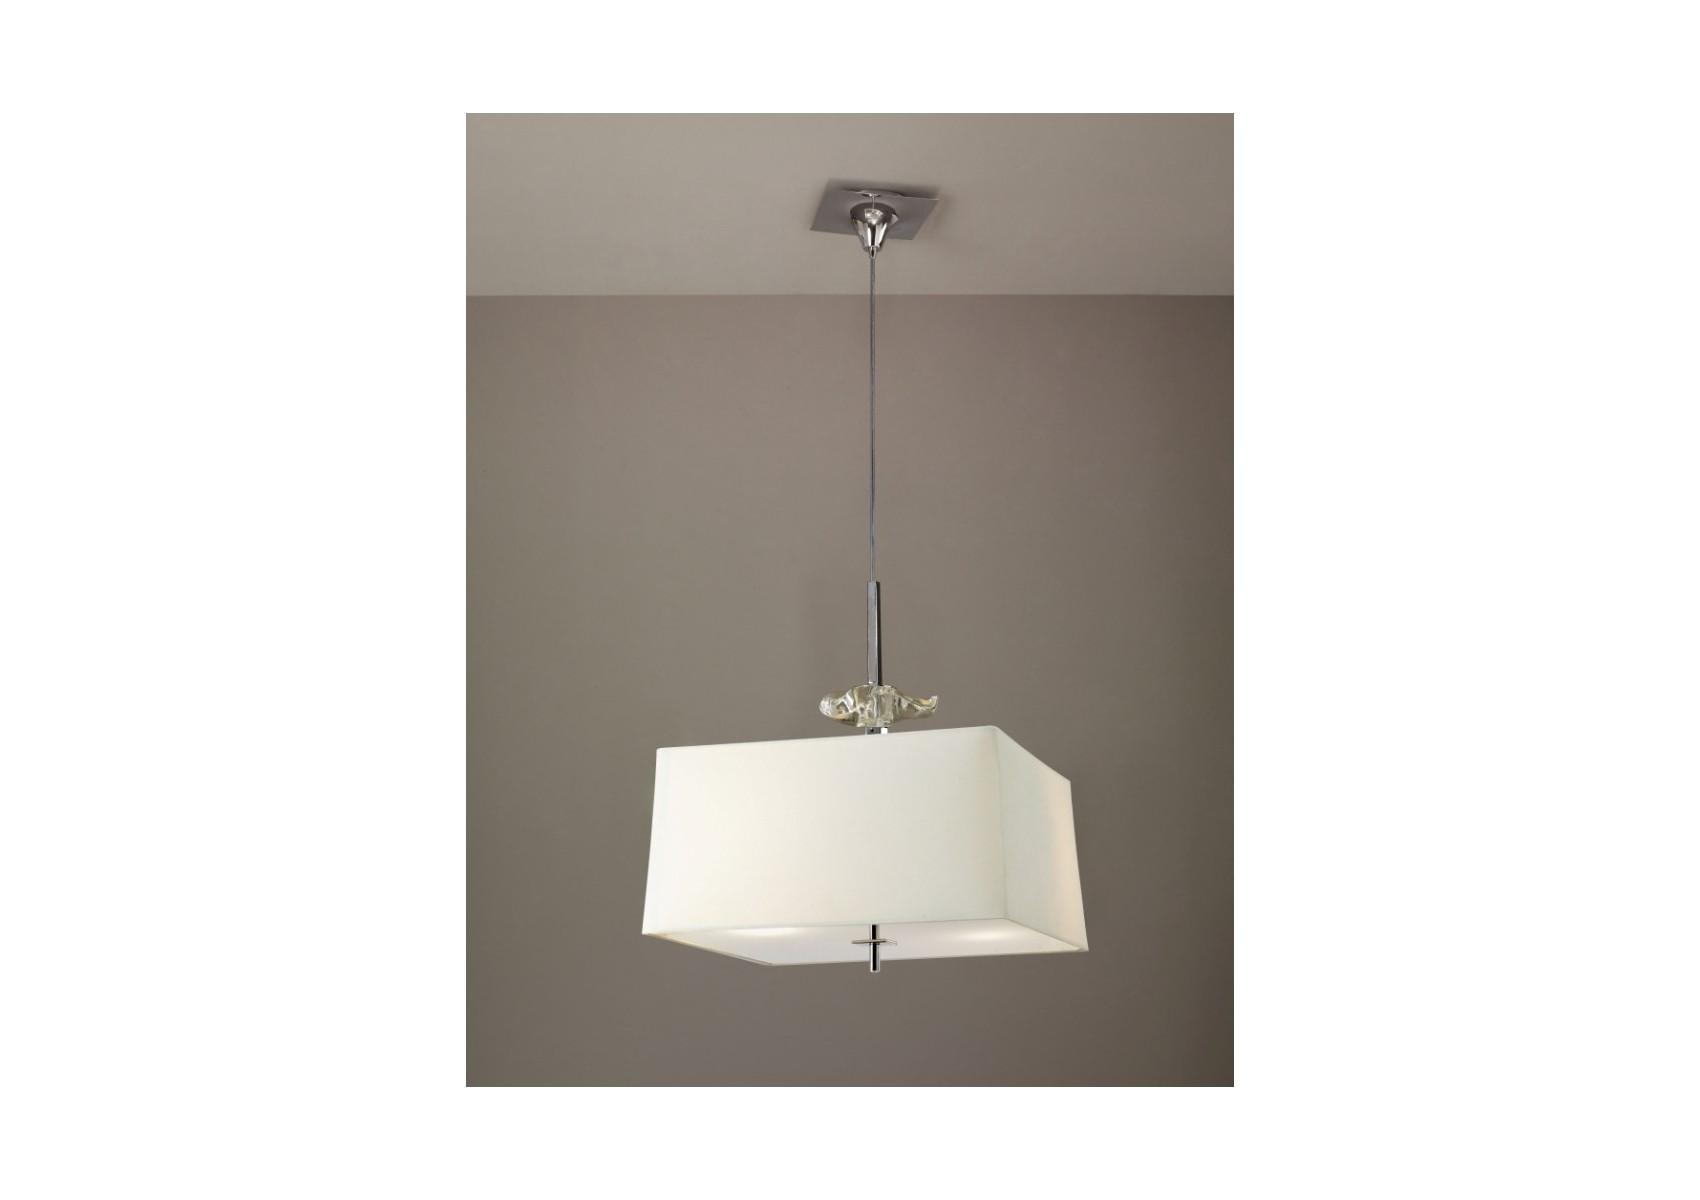 suspension chrome akira 4l mantra boite design. Black Bedroom Furniture Sets. Home Design Ideas